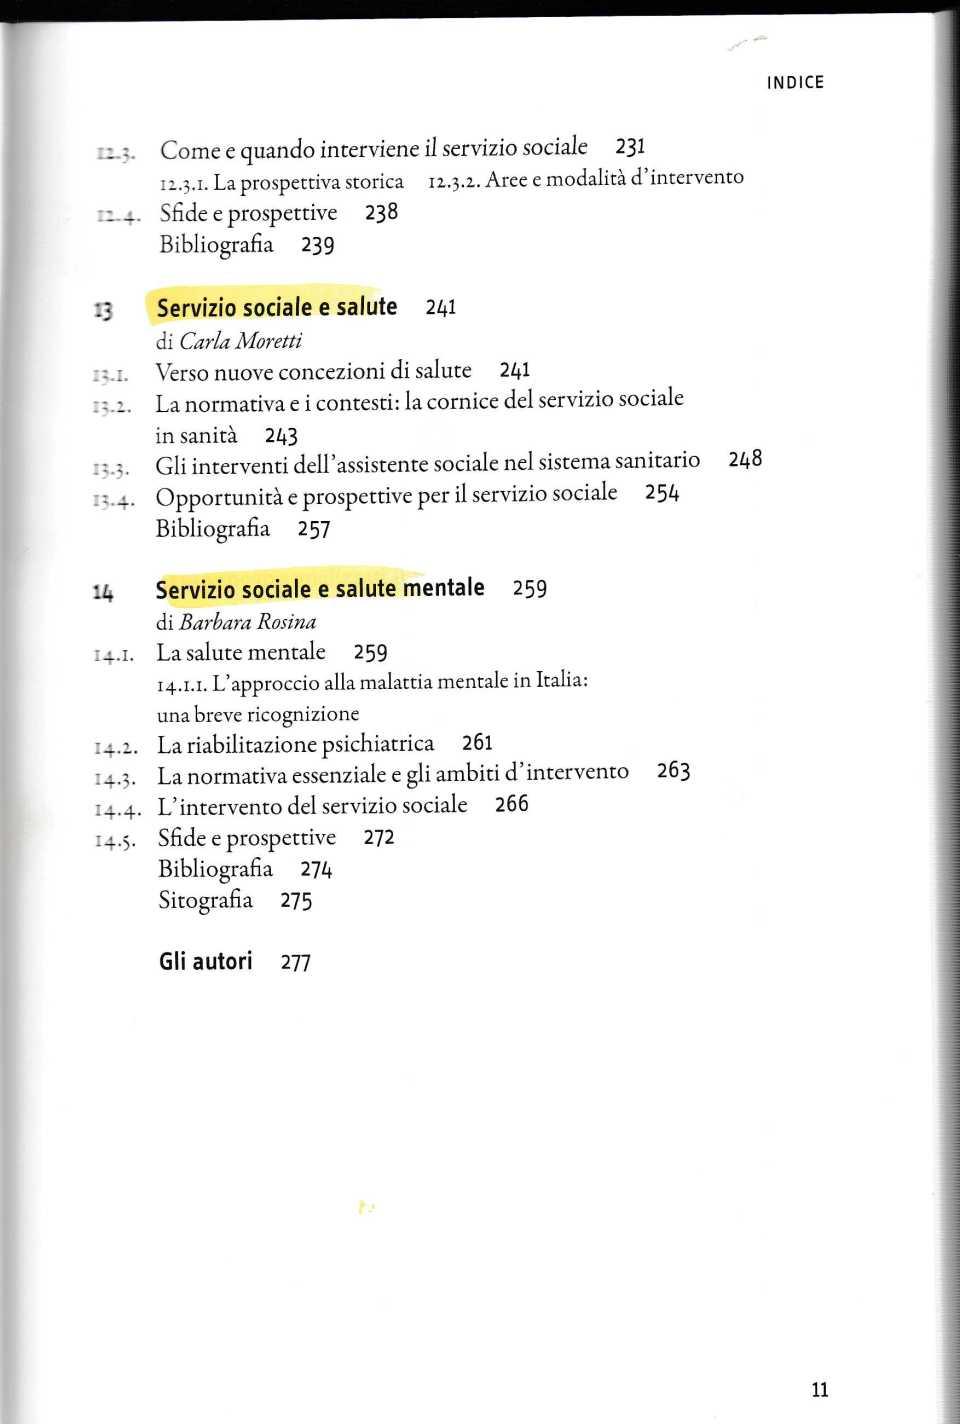 campanini1784